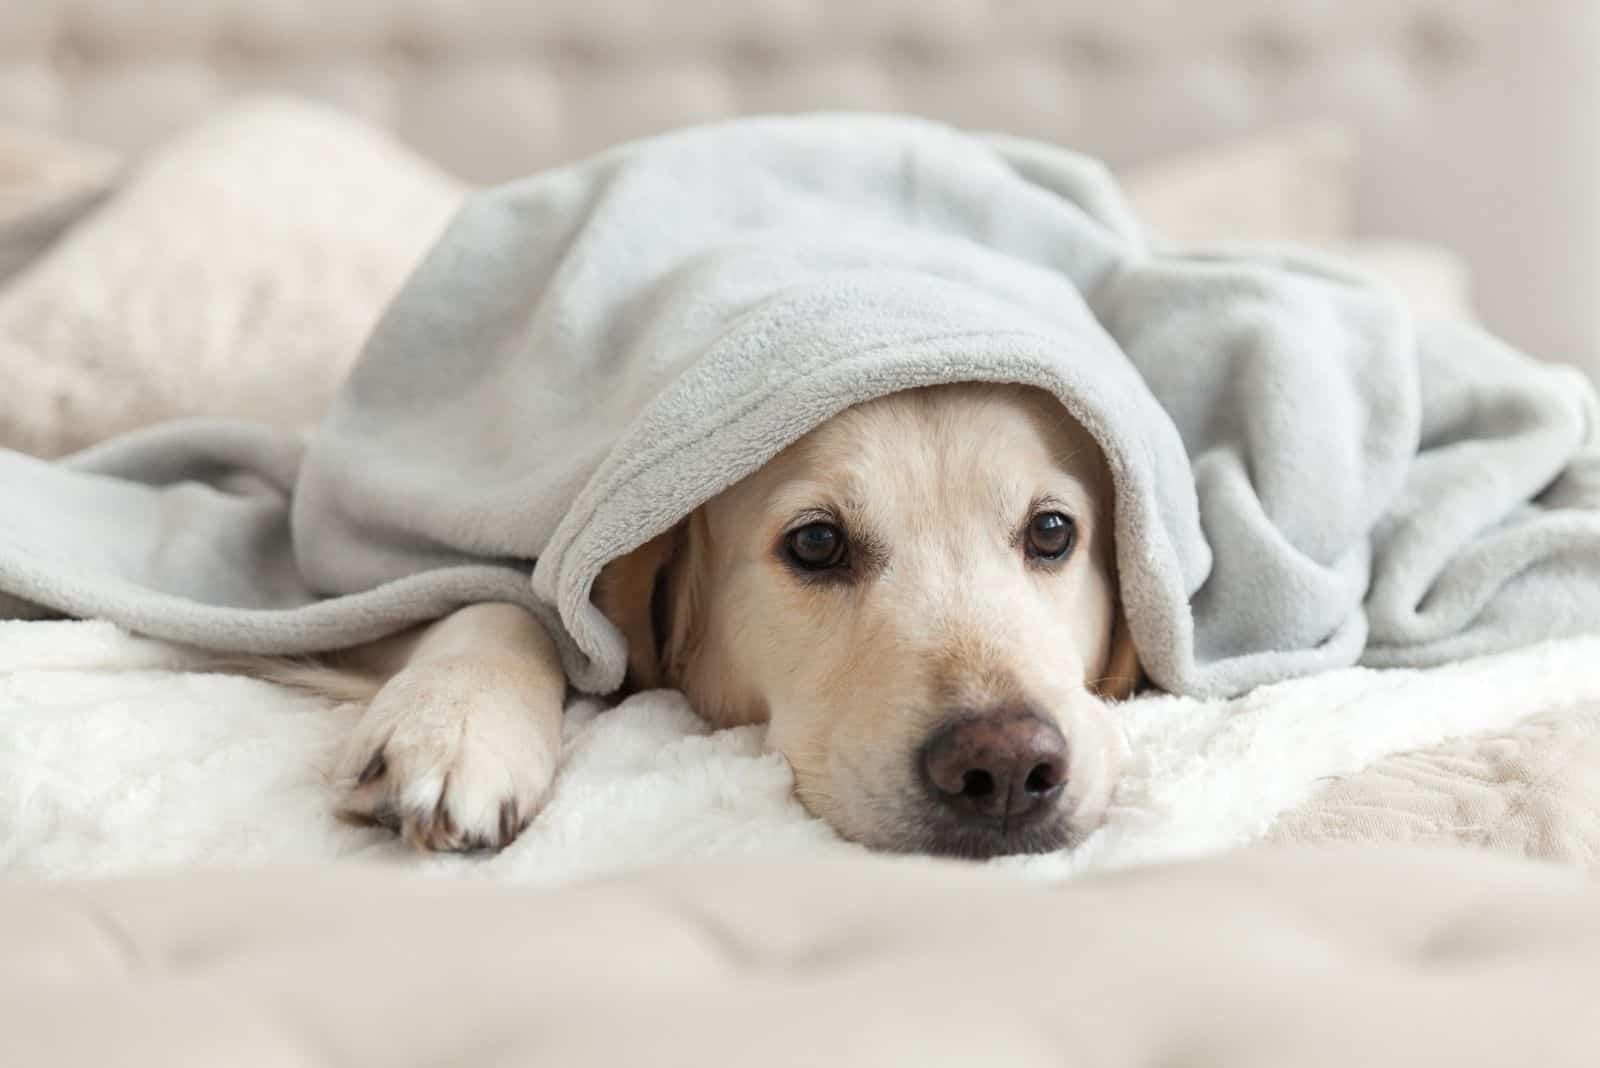 bored golden retriever under a plaid blanket